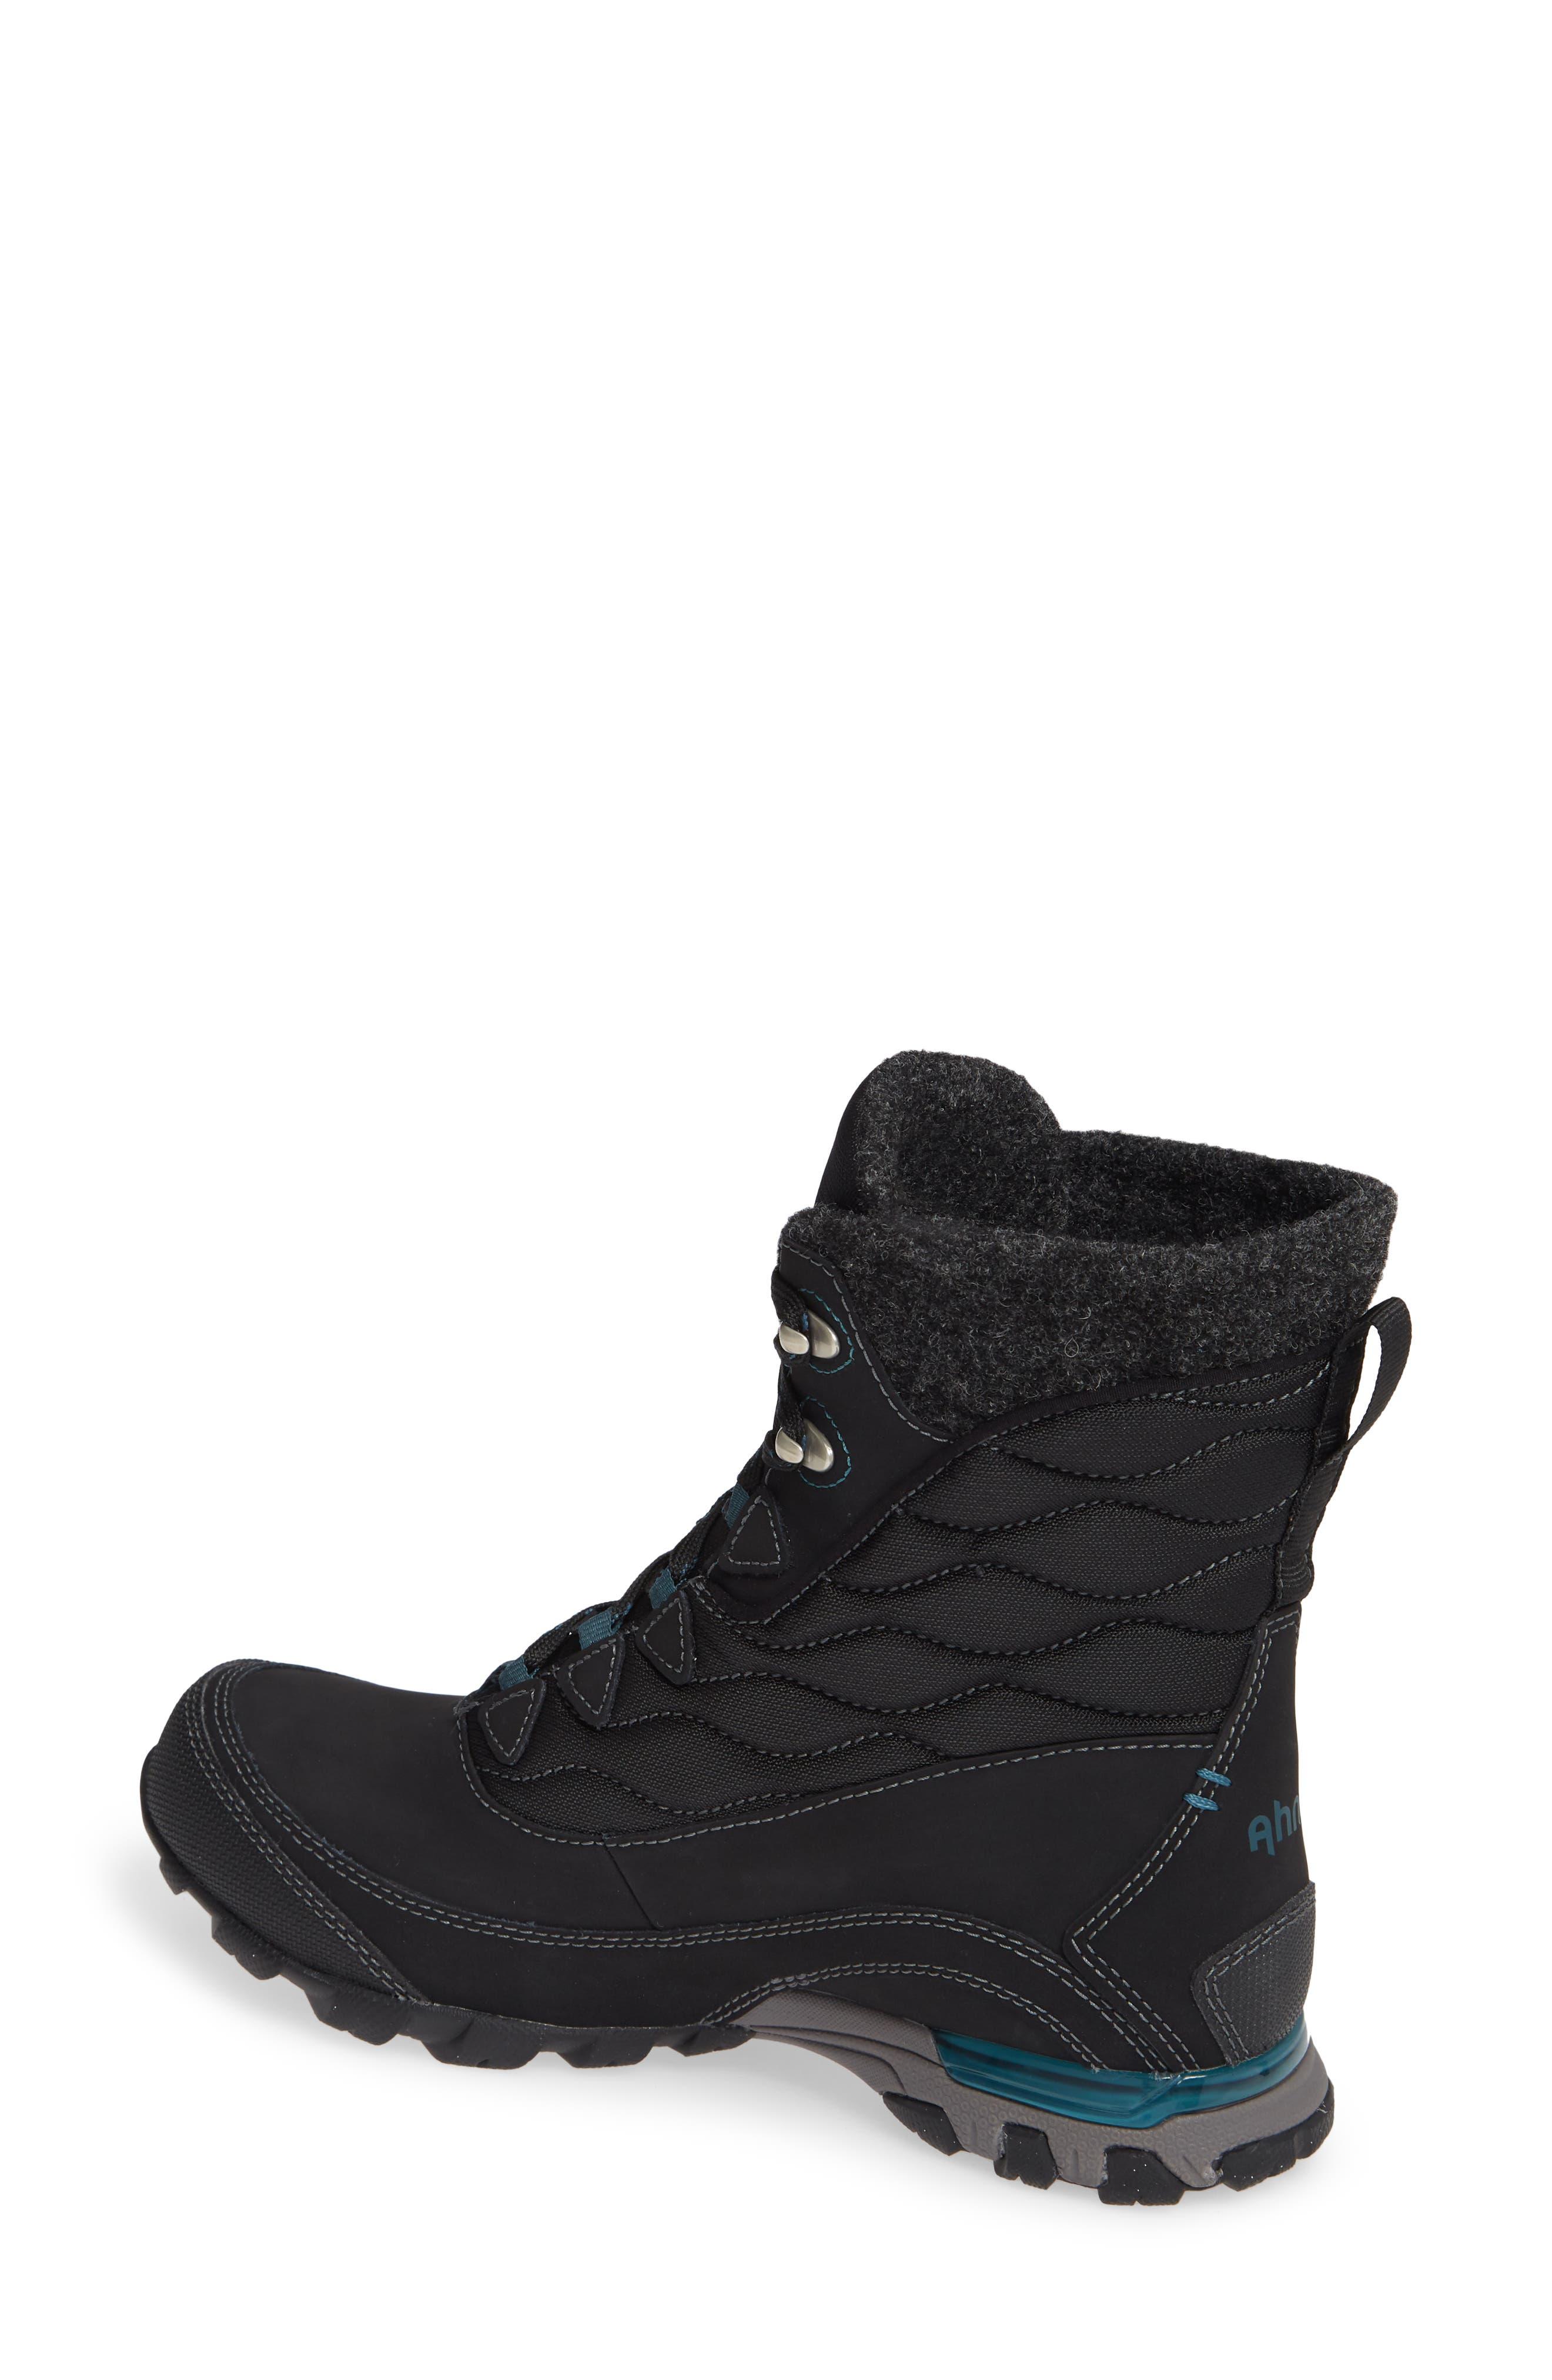 TEVA, Ahnu by Teva Sugarfrost Insulated Waterproof Boot, Alternate thumbnail 2, color, BLACK LEATHER